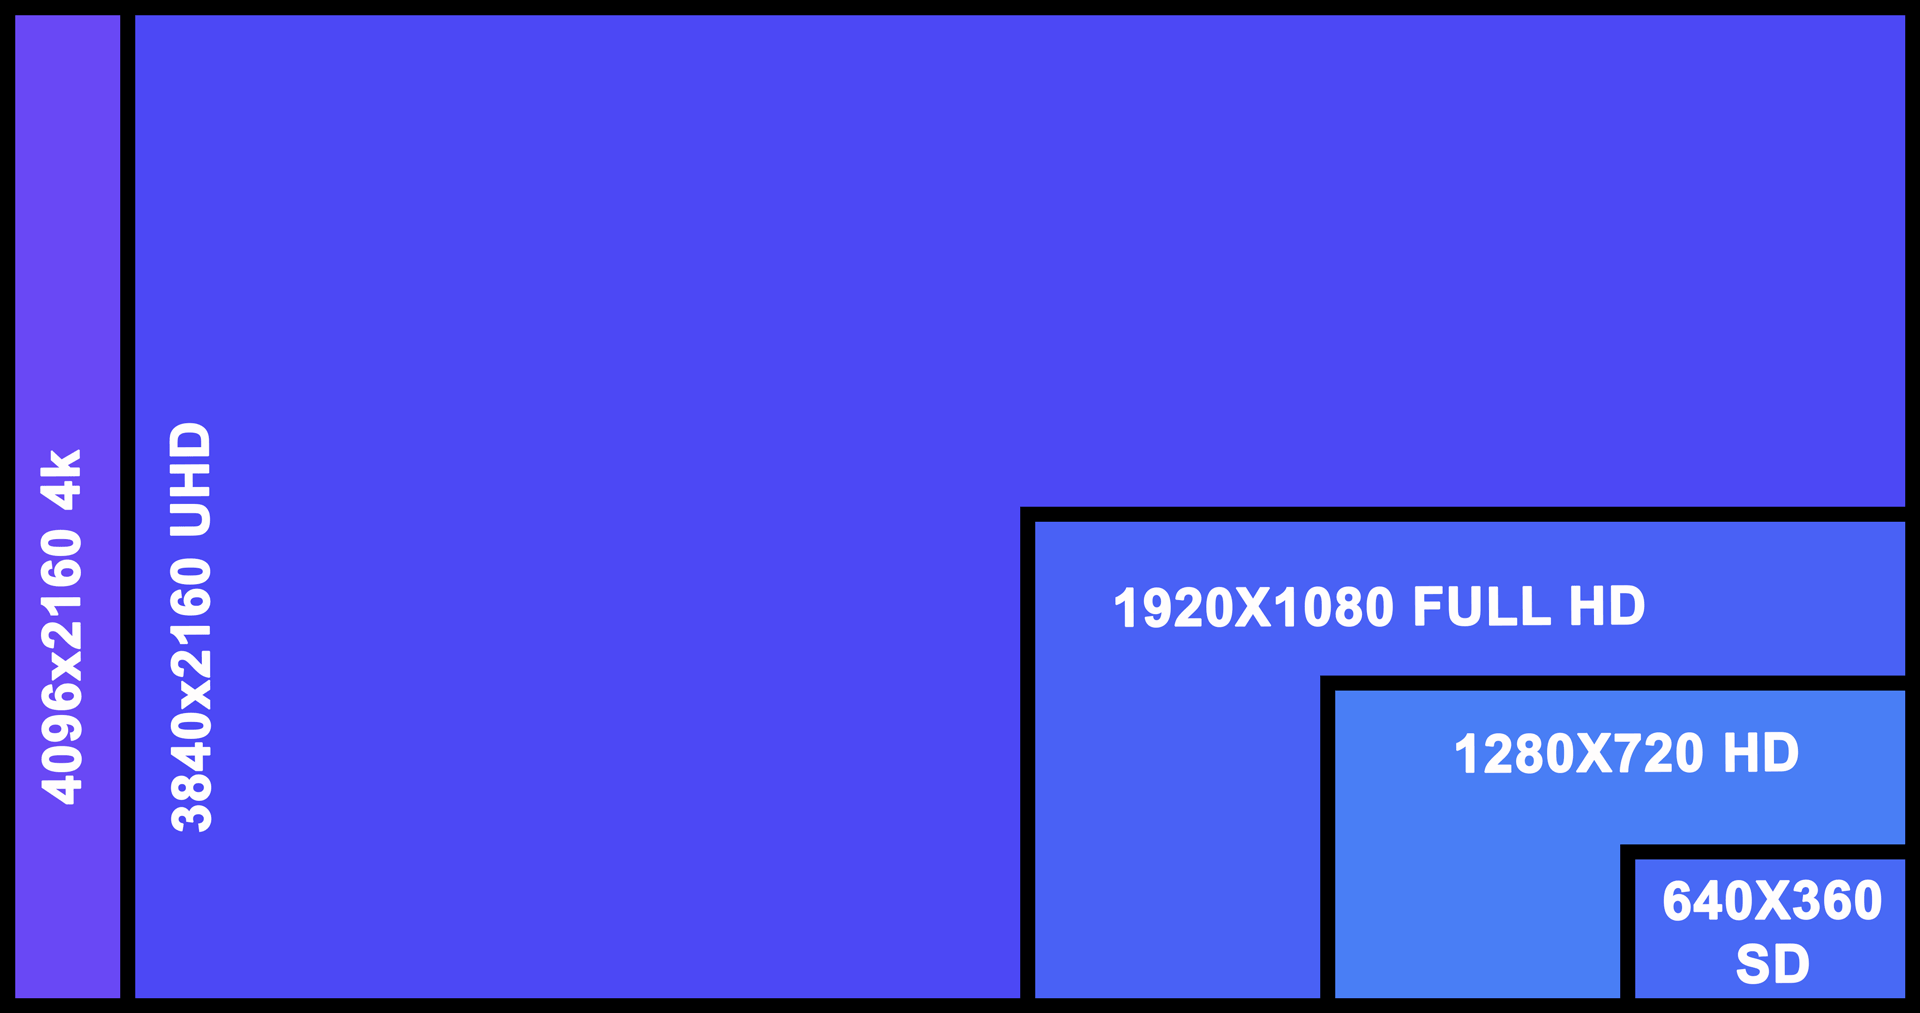 UHD-4K-HD-SD-resolution-comparison.png